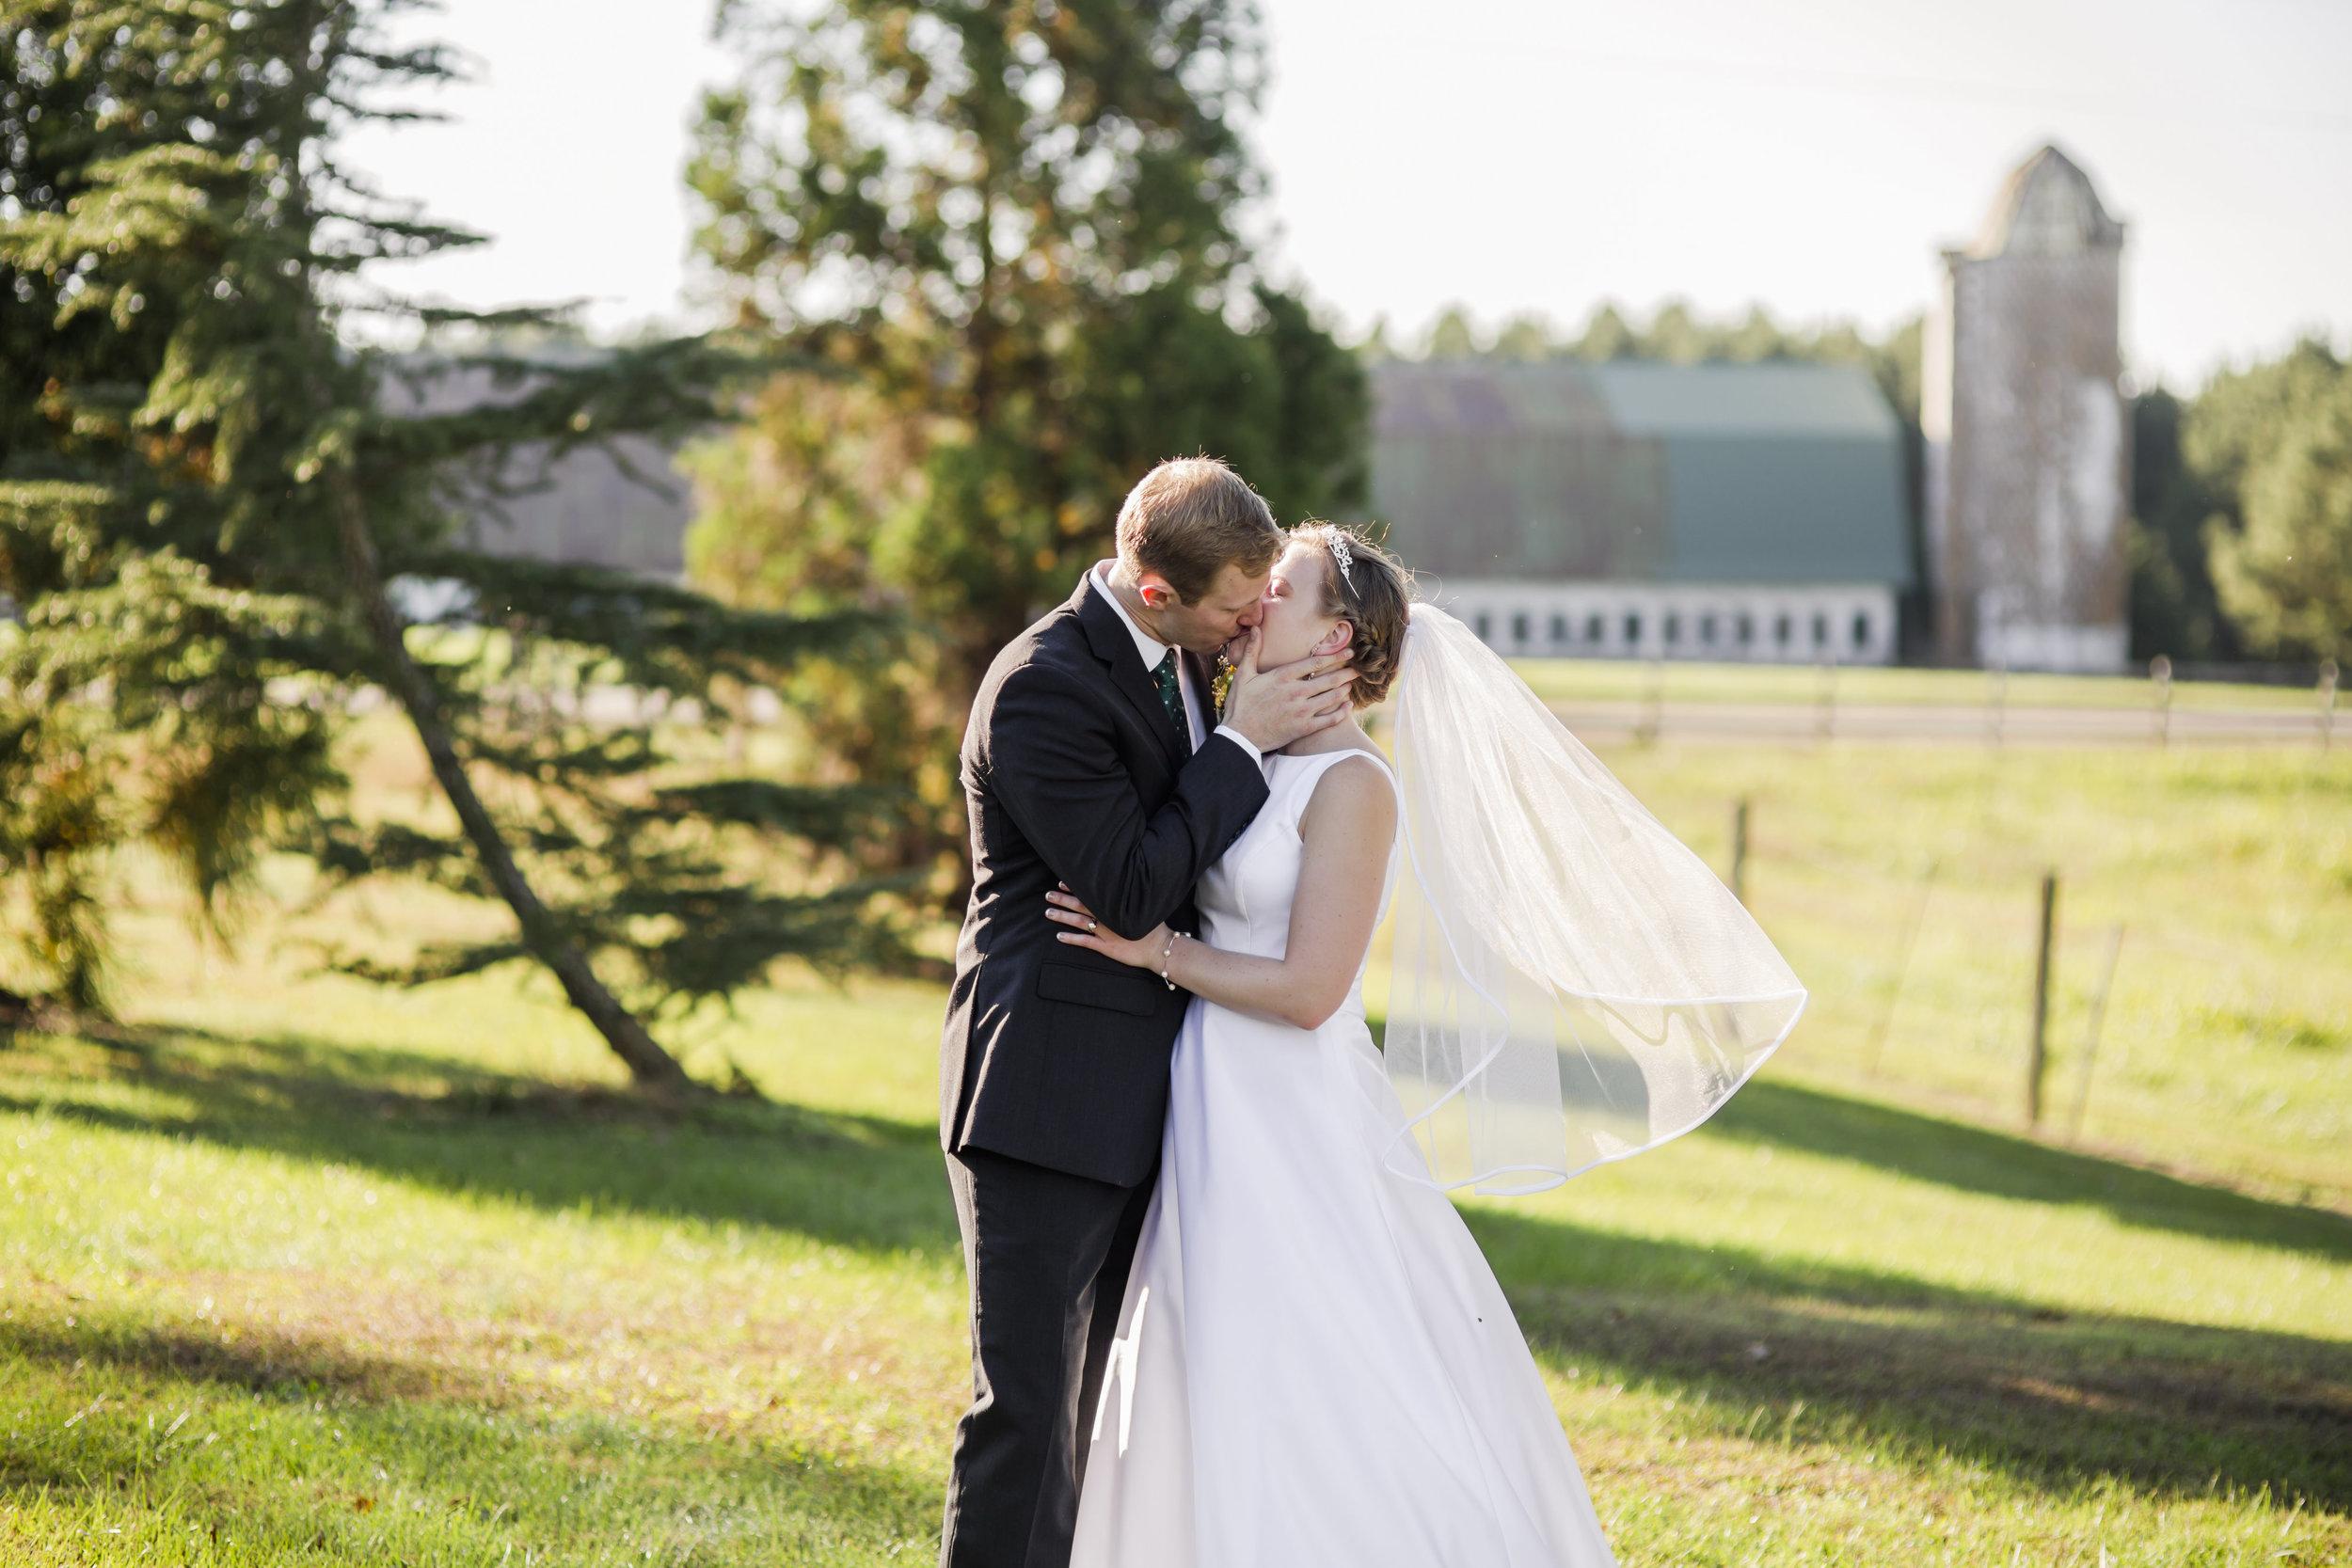 10 29 2016 wedding-Formal Pictures-0209.jpg